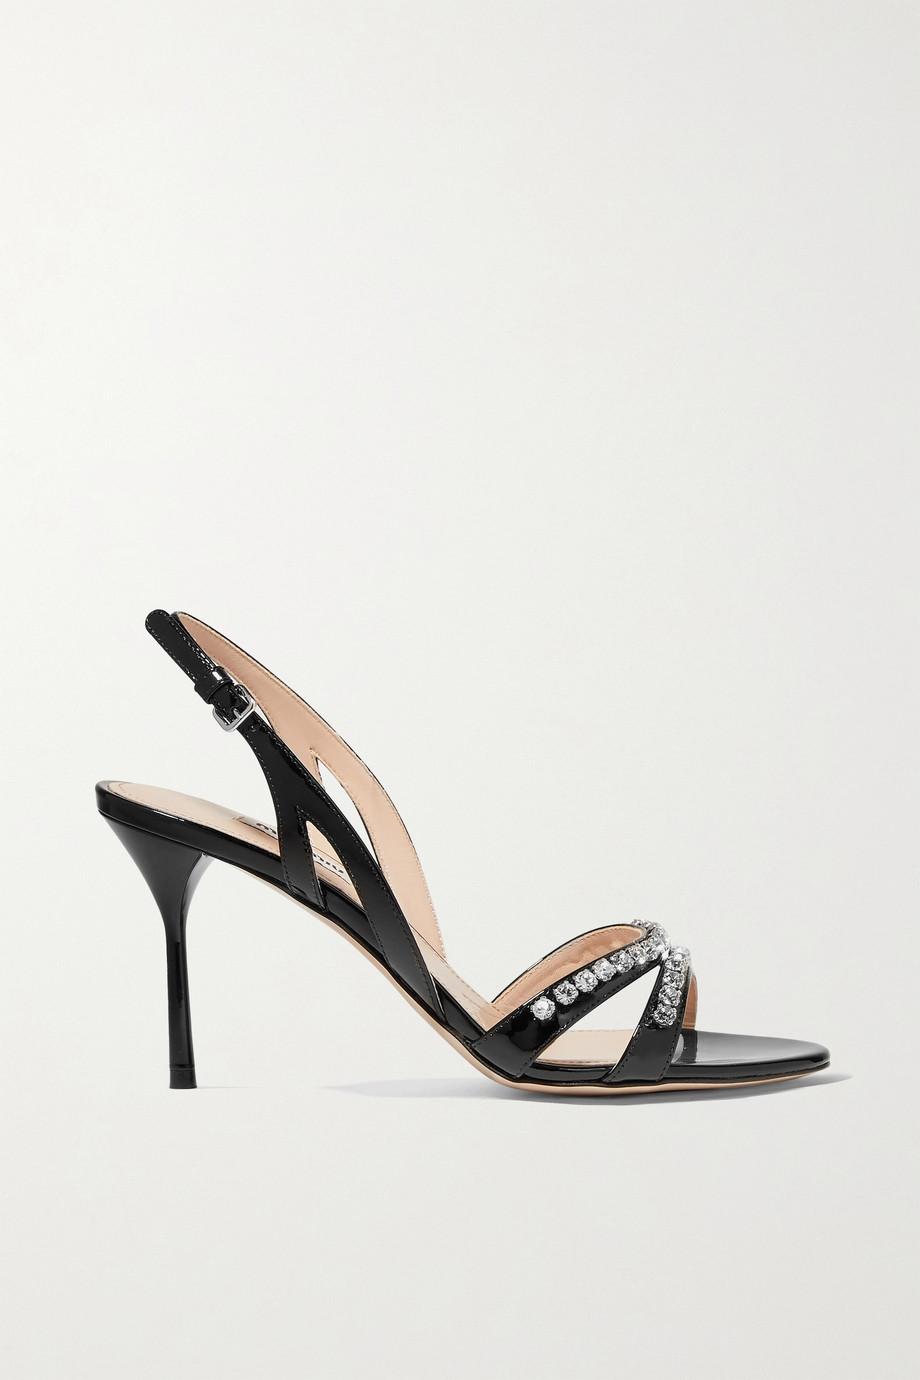 Miu Miu Slingback-Sandalen aus Lackleder mit Kristallen